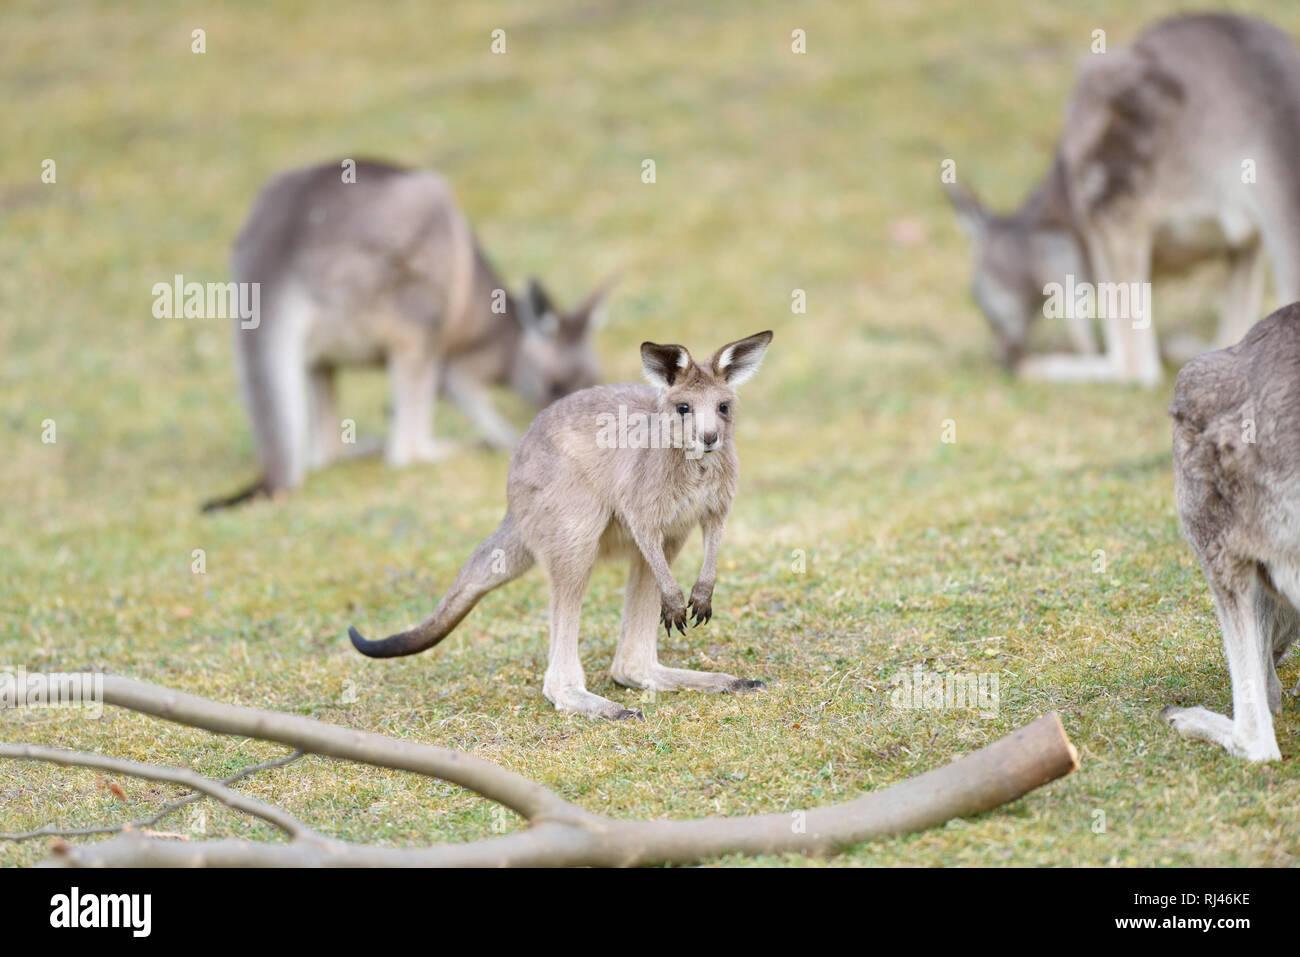 ?stliches Graues Riesenk?nguru, Macropus giganteus, Jungtier, Wiese, hocken, Blick Kamera - Stock Image